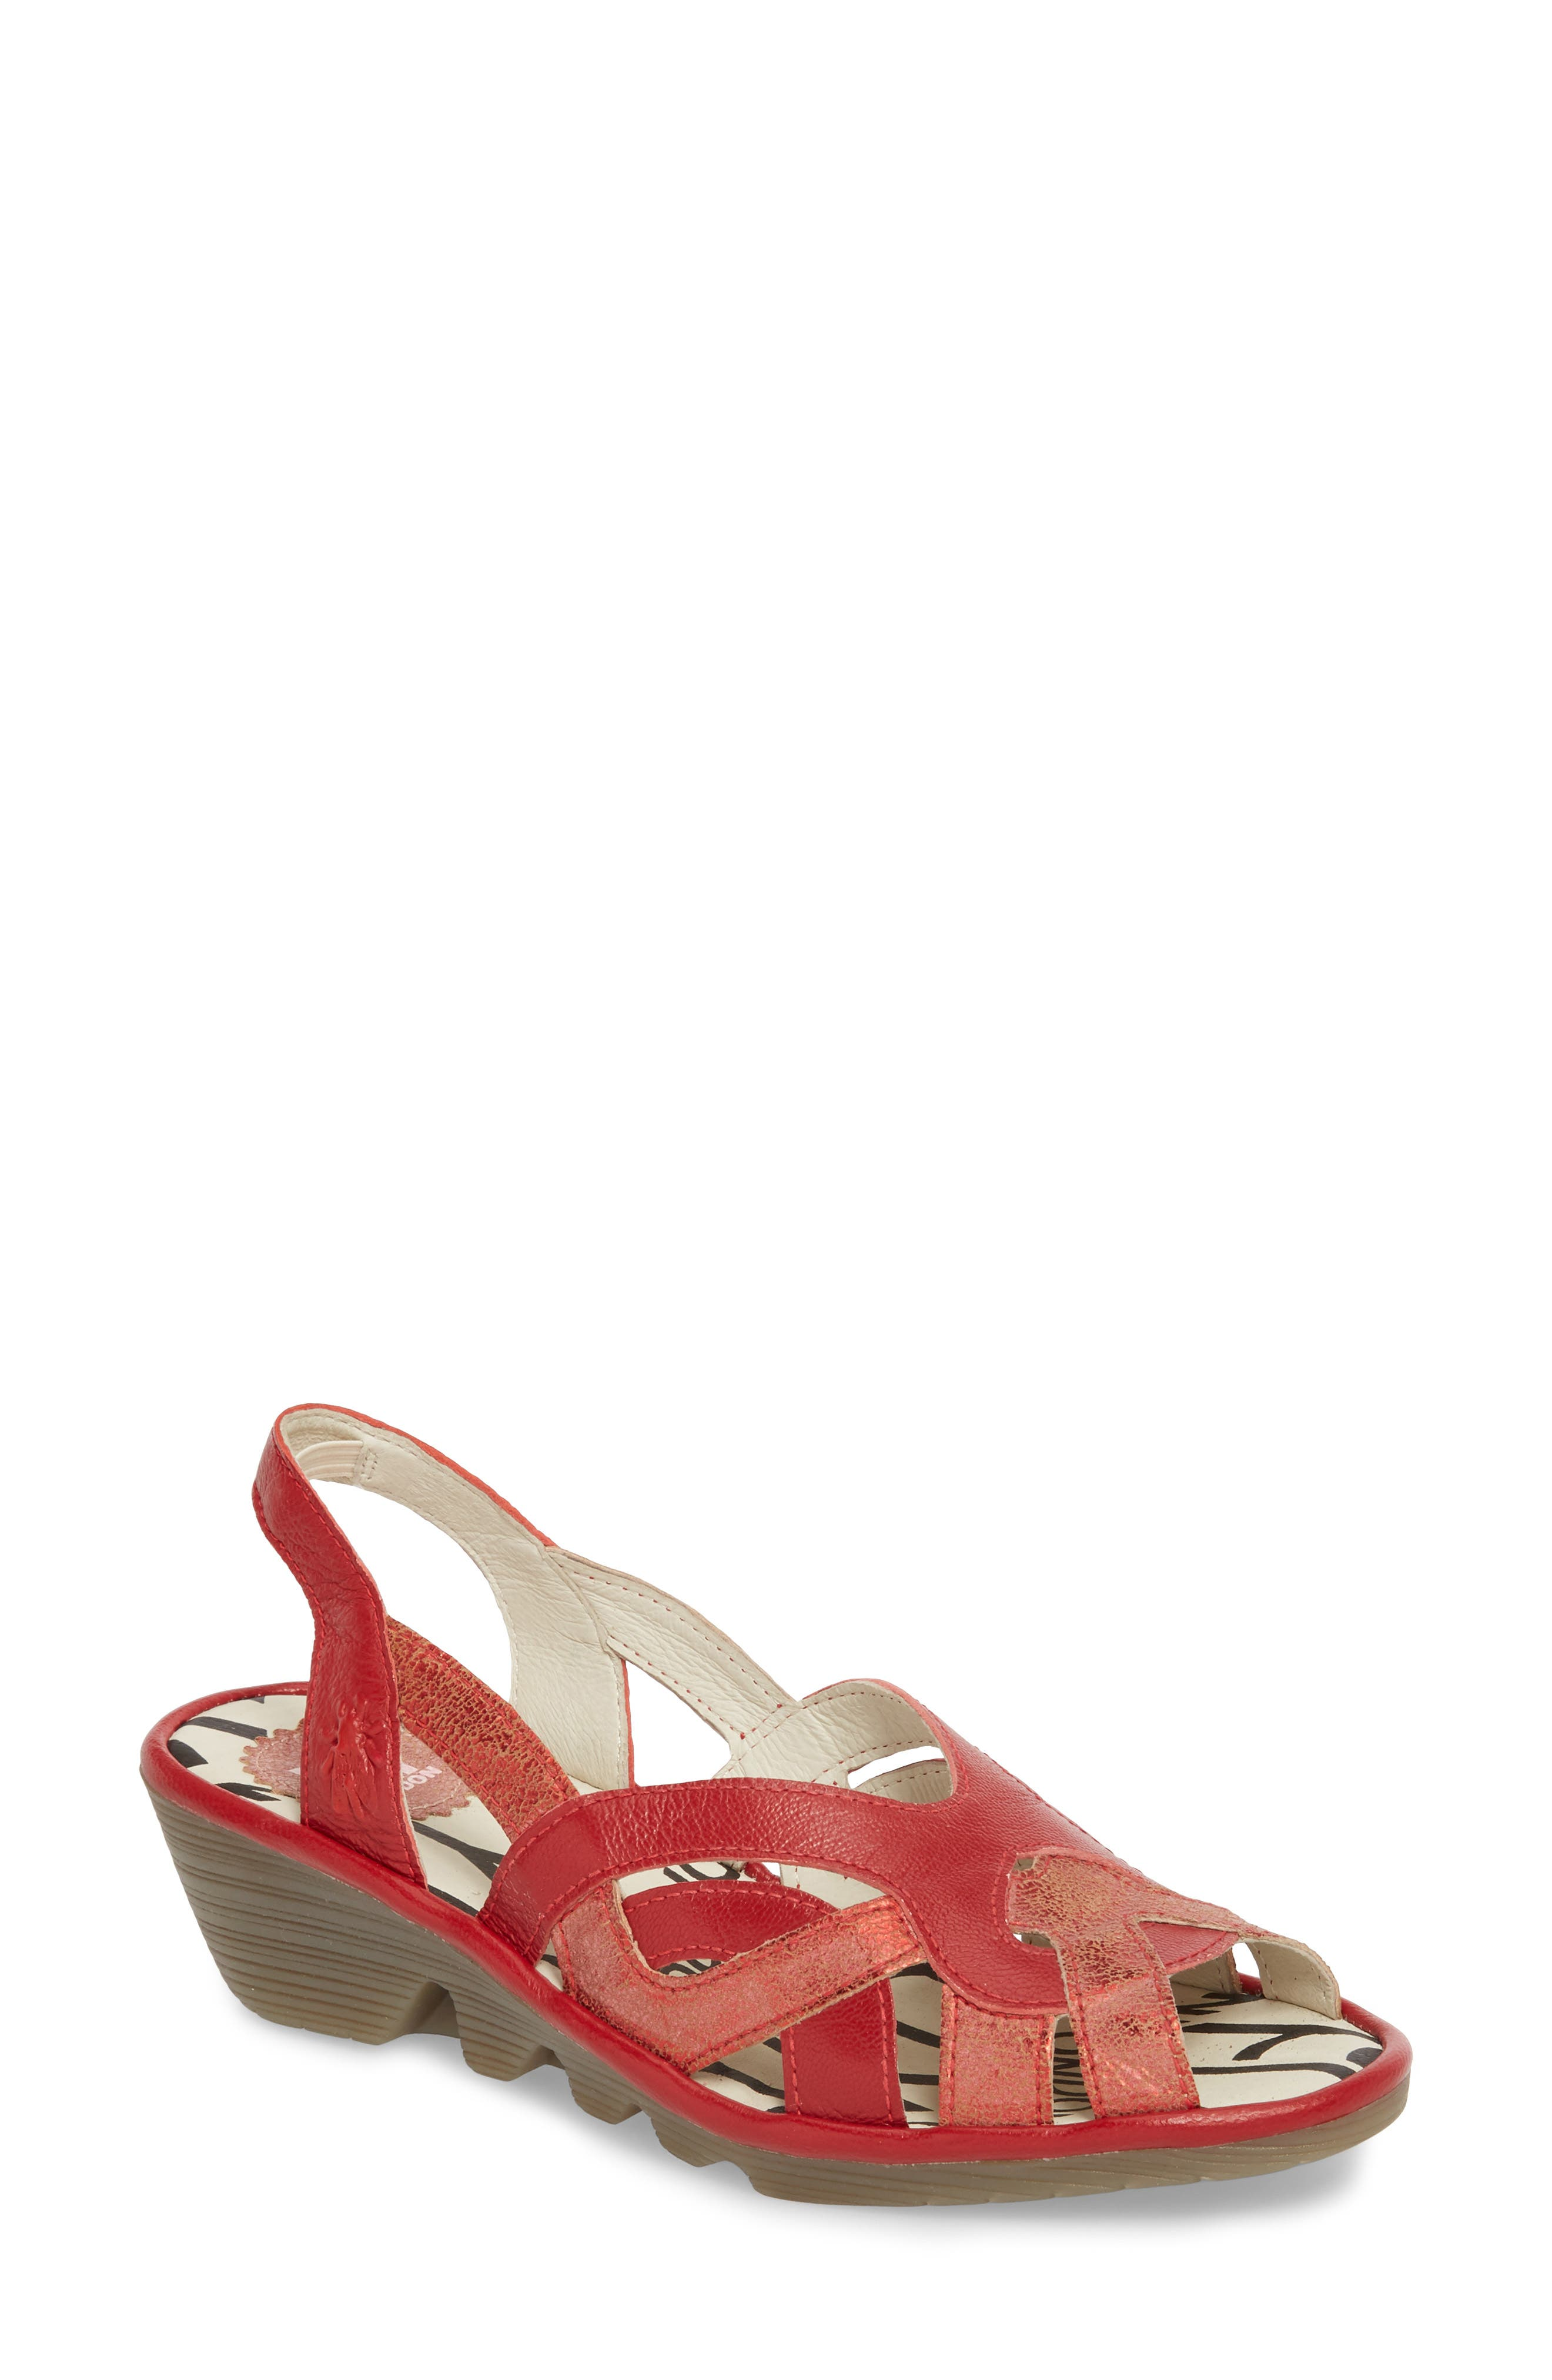 Pima Sandal,                             Main thumbnail 1, color,                             Red Mix Leather